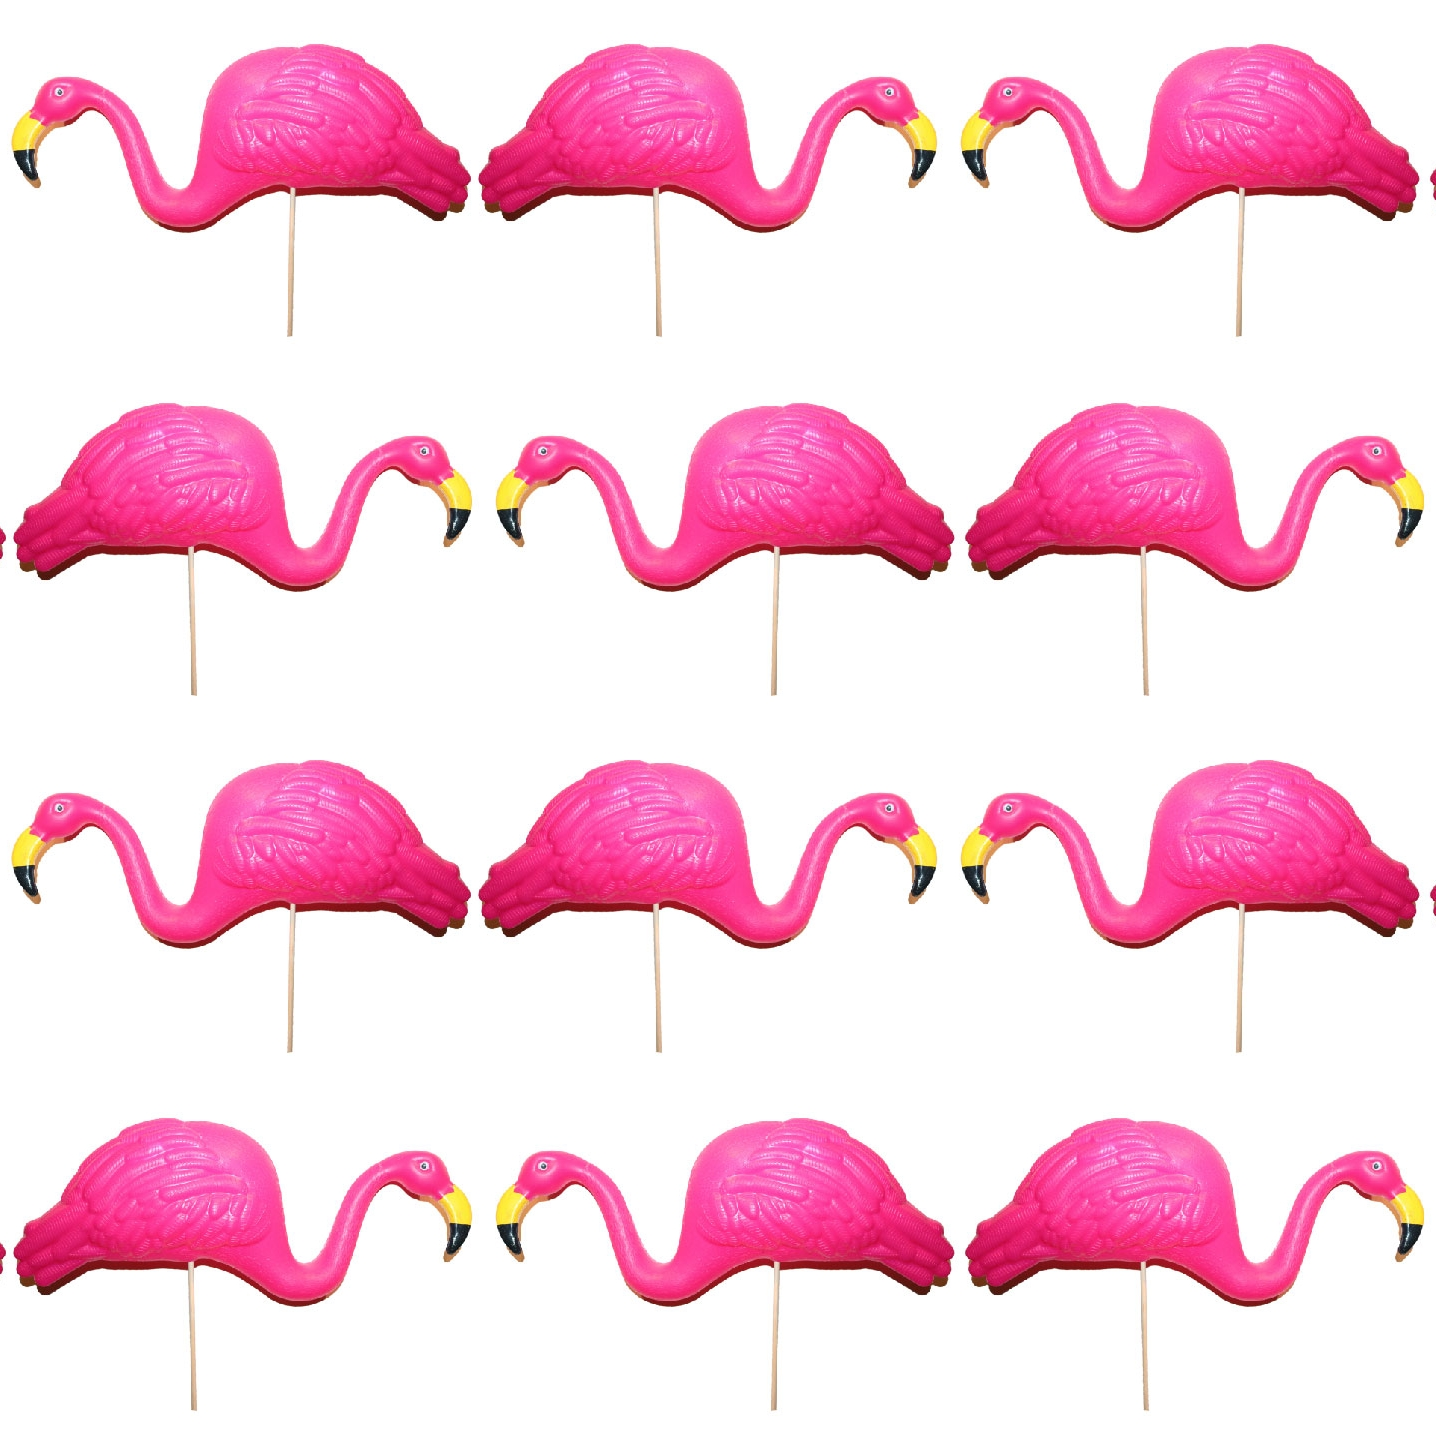 flamingo-01.jpg